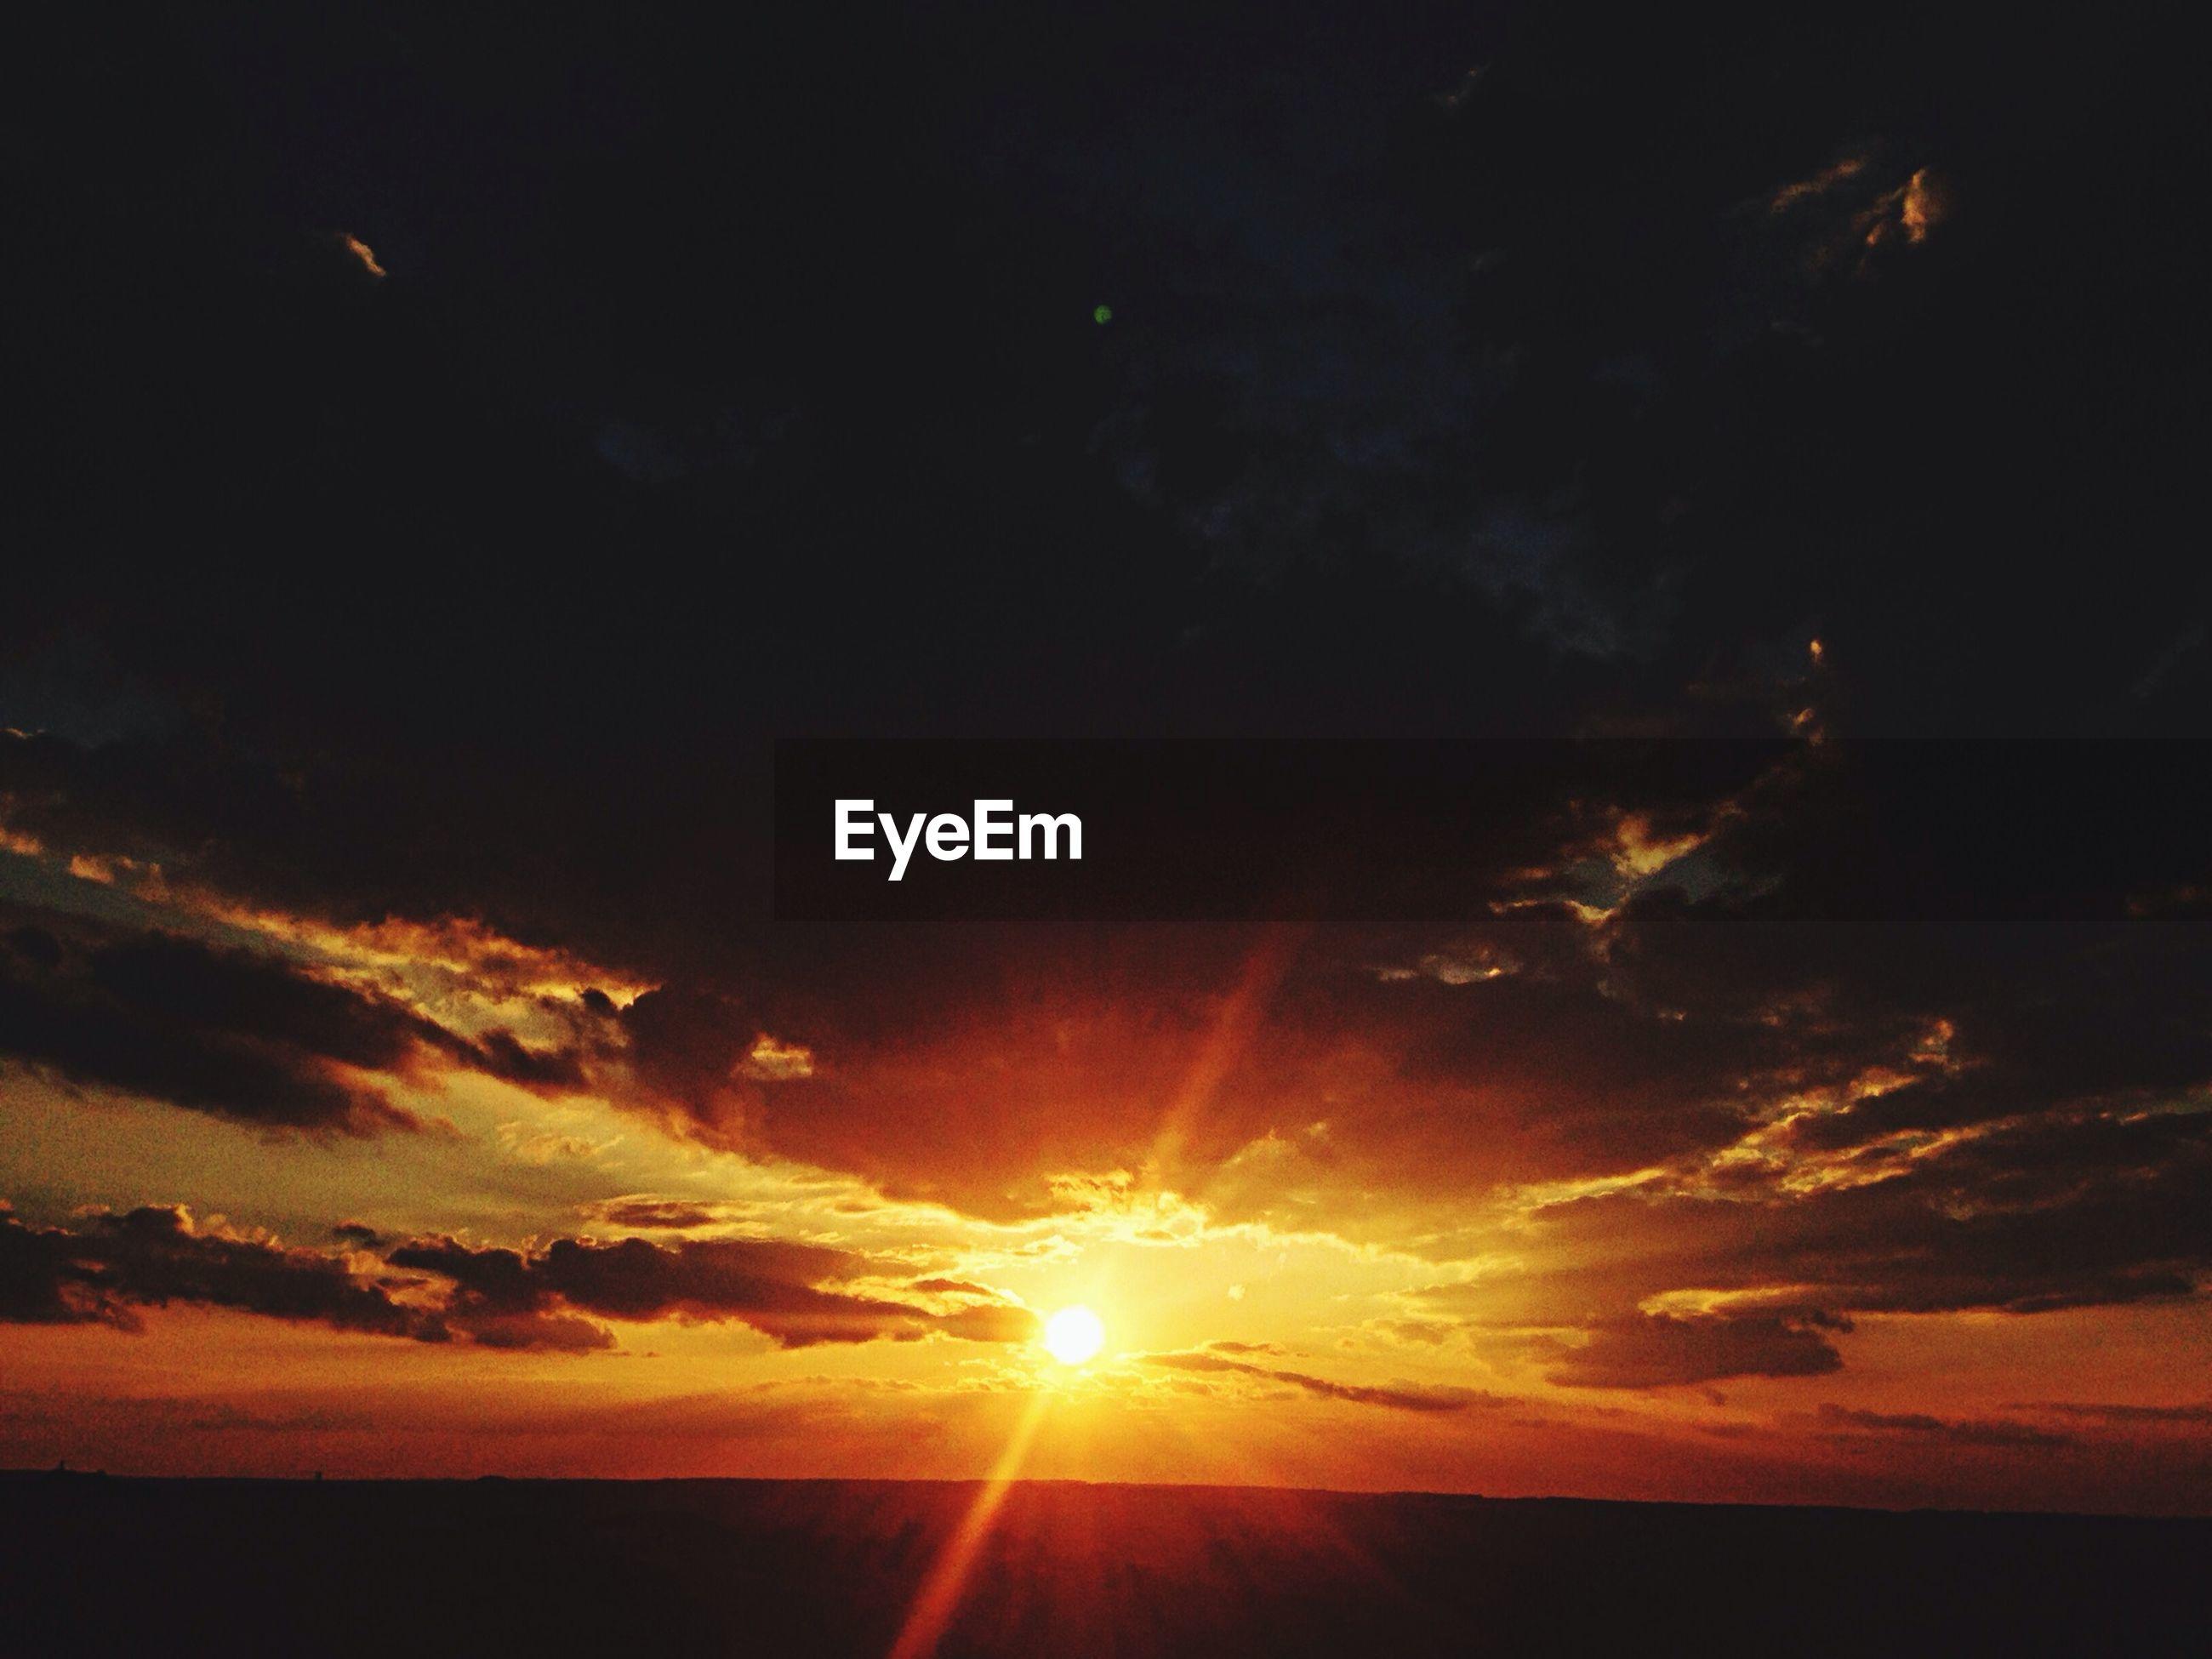 sunset, sun, scenics, tranquil scene, beauty in nature, tranquility, sky, silhouette, nature, idyllic, orange color, sunlight, sunbeam, landscape, cloud - sky, outdoors, dark, dramatic sky, low angle view, no people